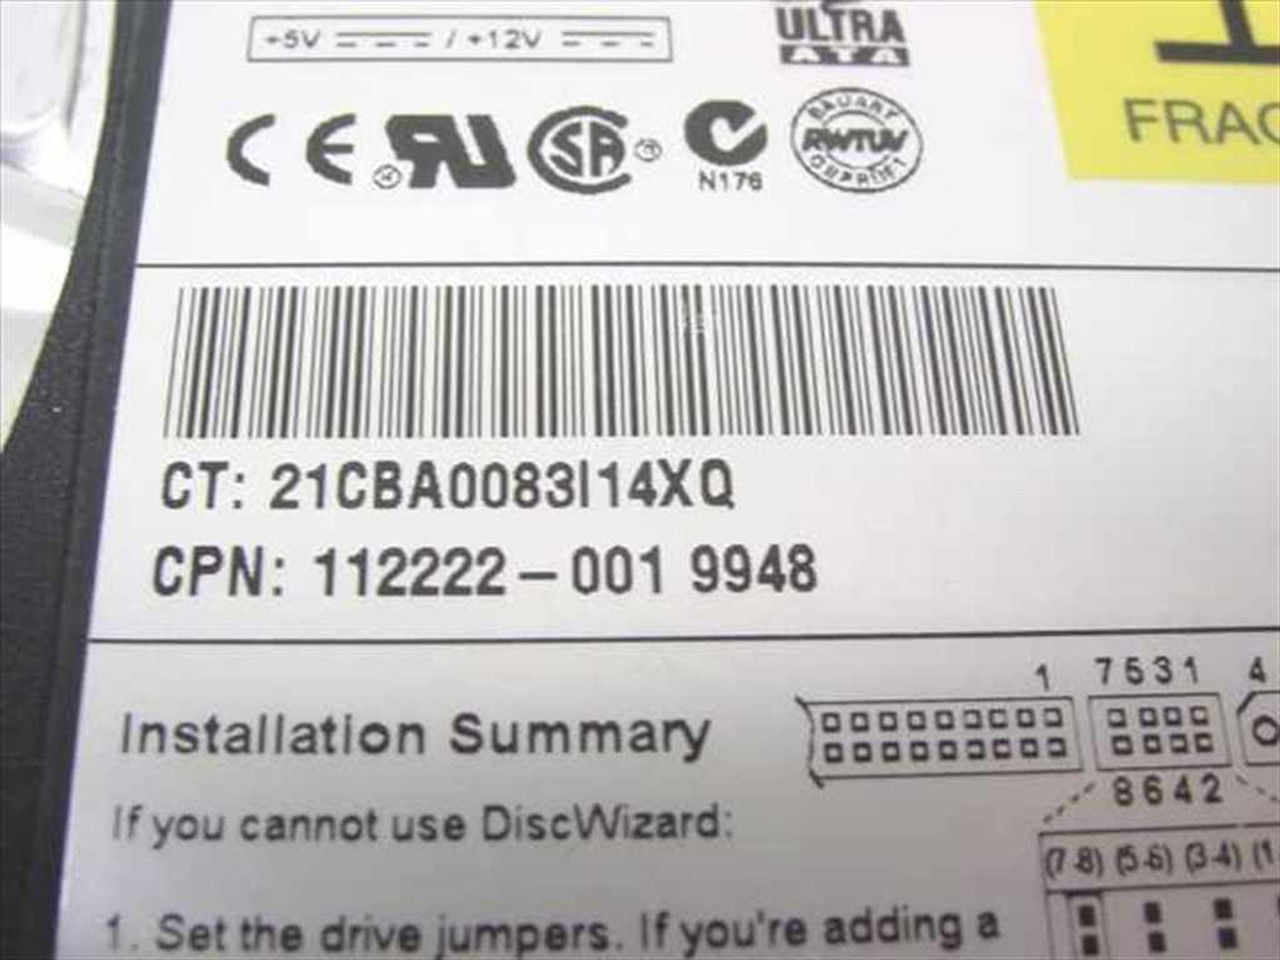 Compaq 11222-001 4 3GB 3 5